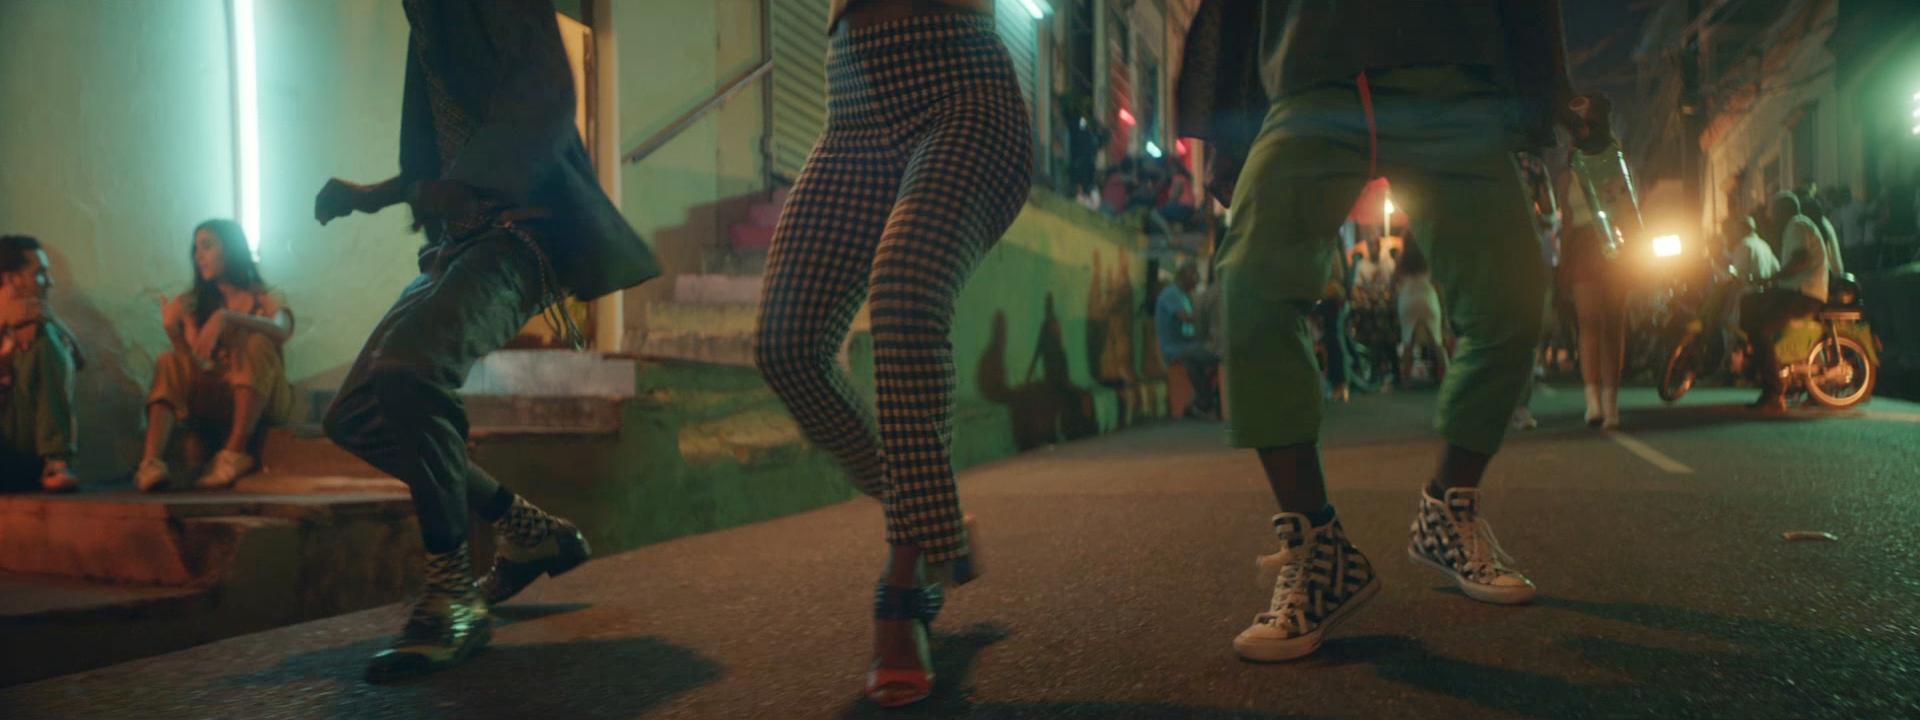 DanceFloor_Frame5